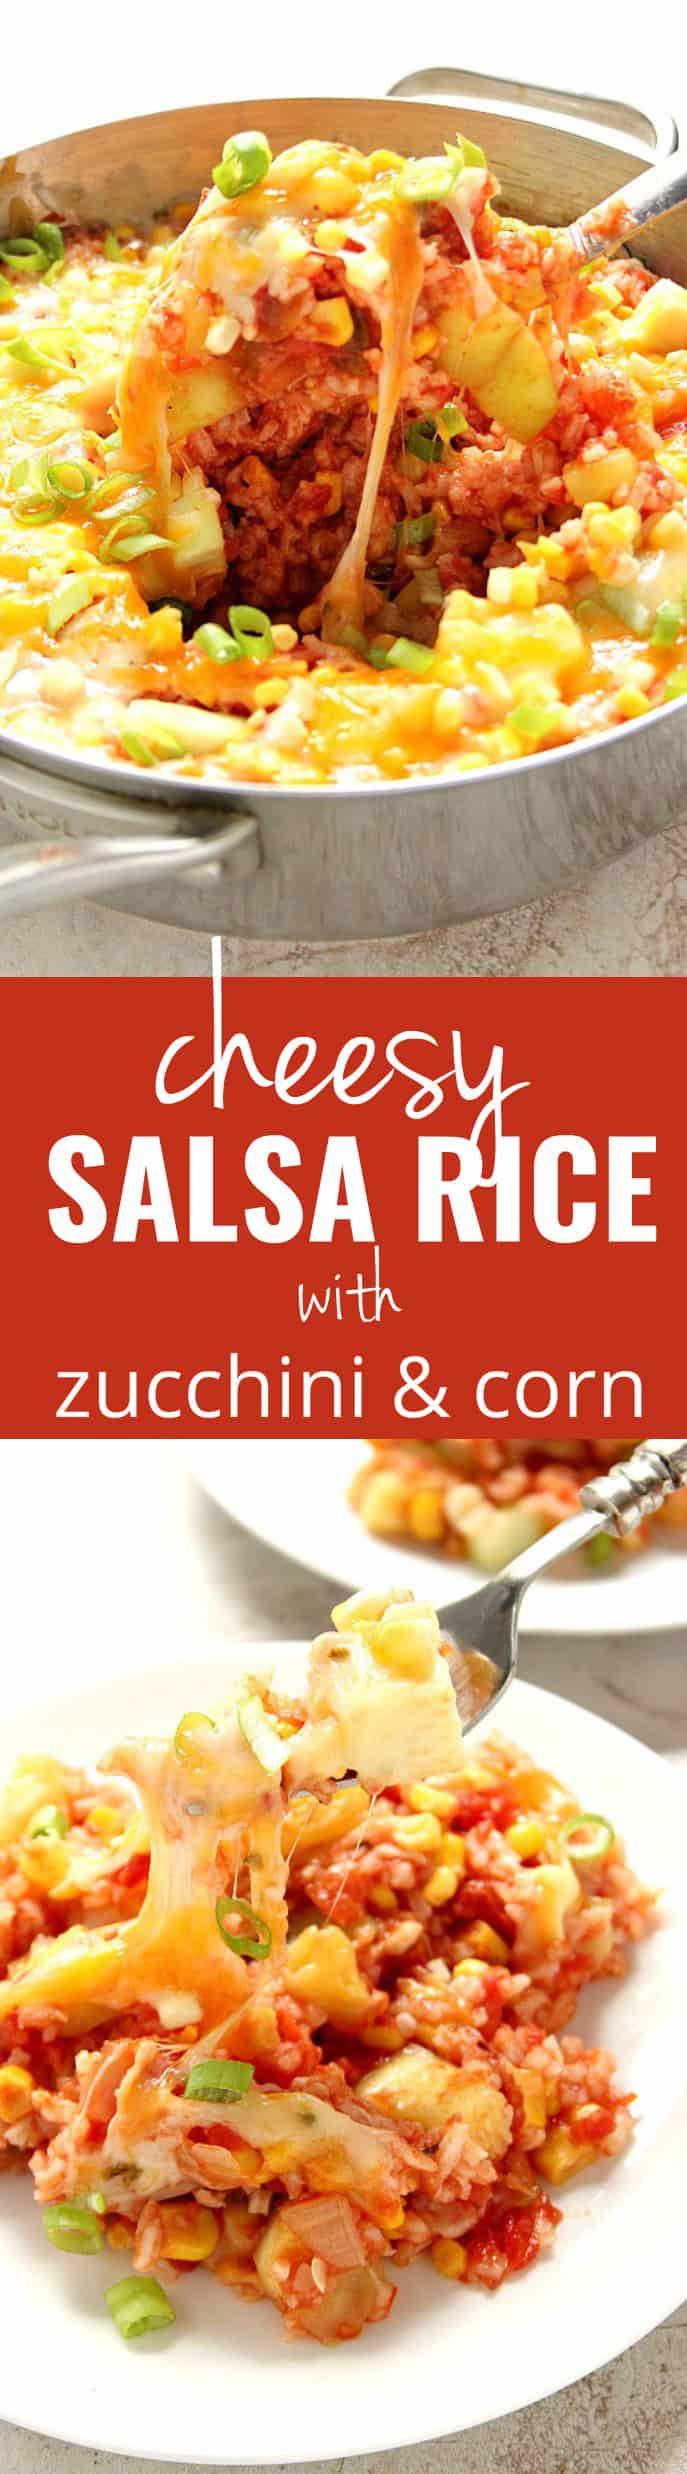 cheesy salsa rice long 1 Cheesy Salsa Rice with Zucchini and Corn Recipe